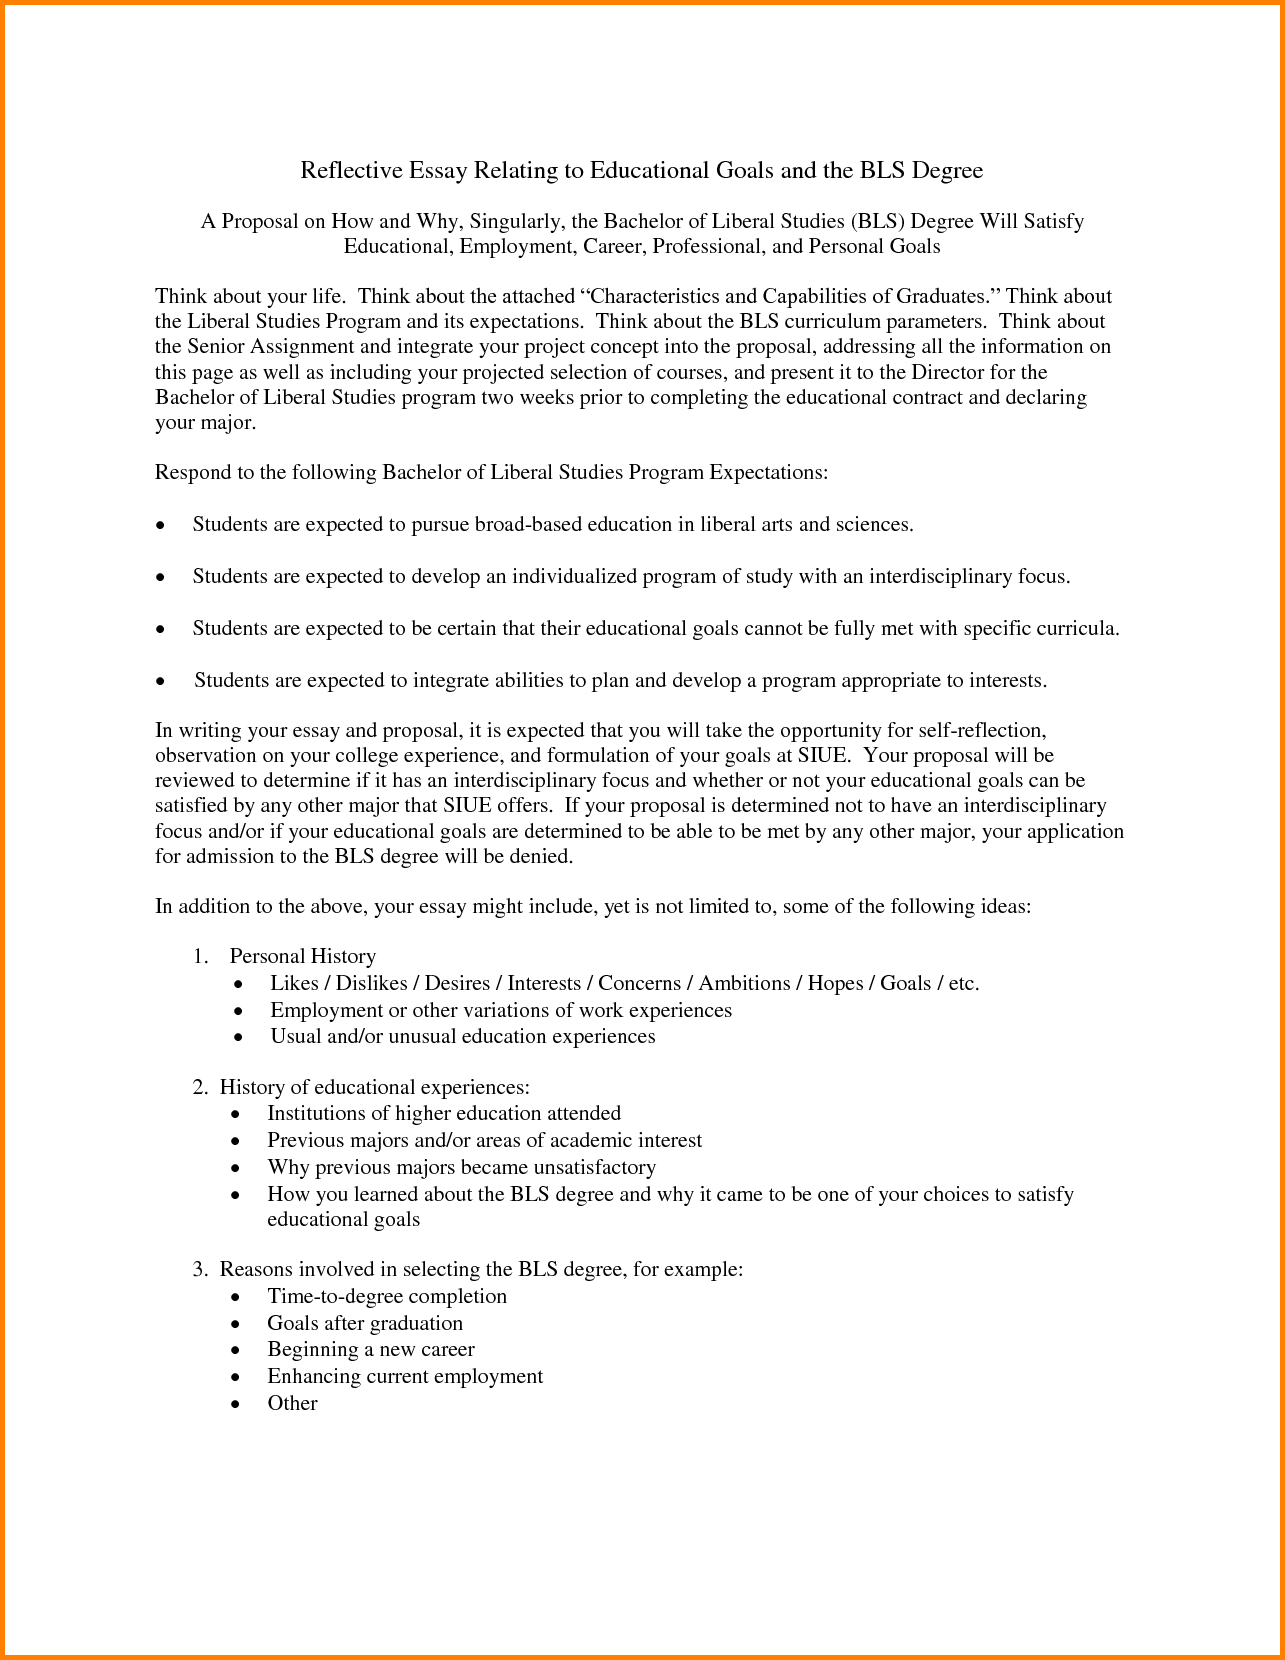 Georgetown application essay goals